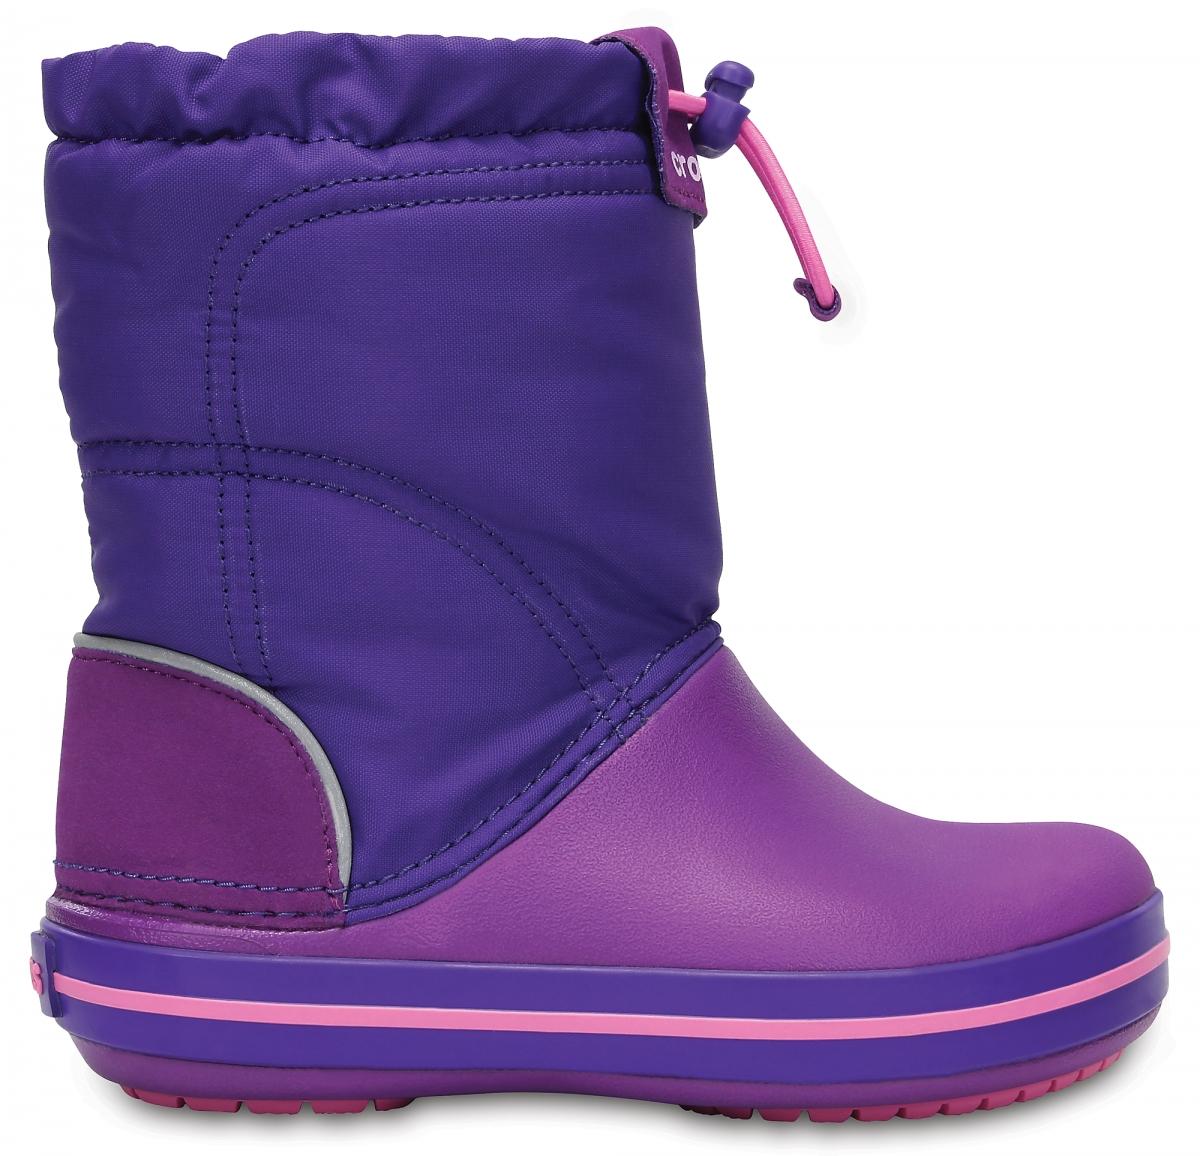 Crocs Crocband LodgePoint Boot Kids - Amethyst/Ultraviolet, C12 (29-30)